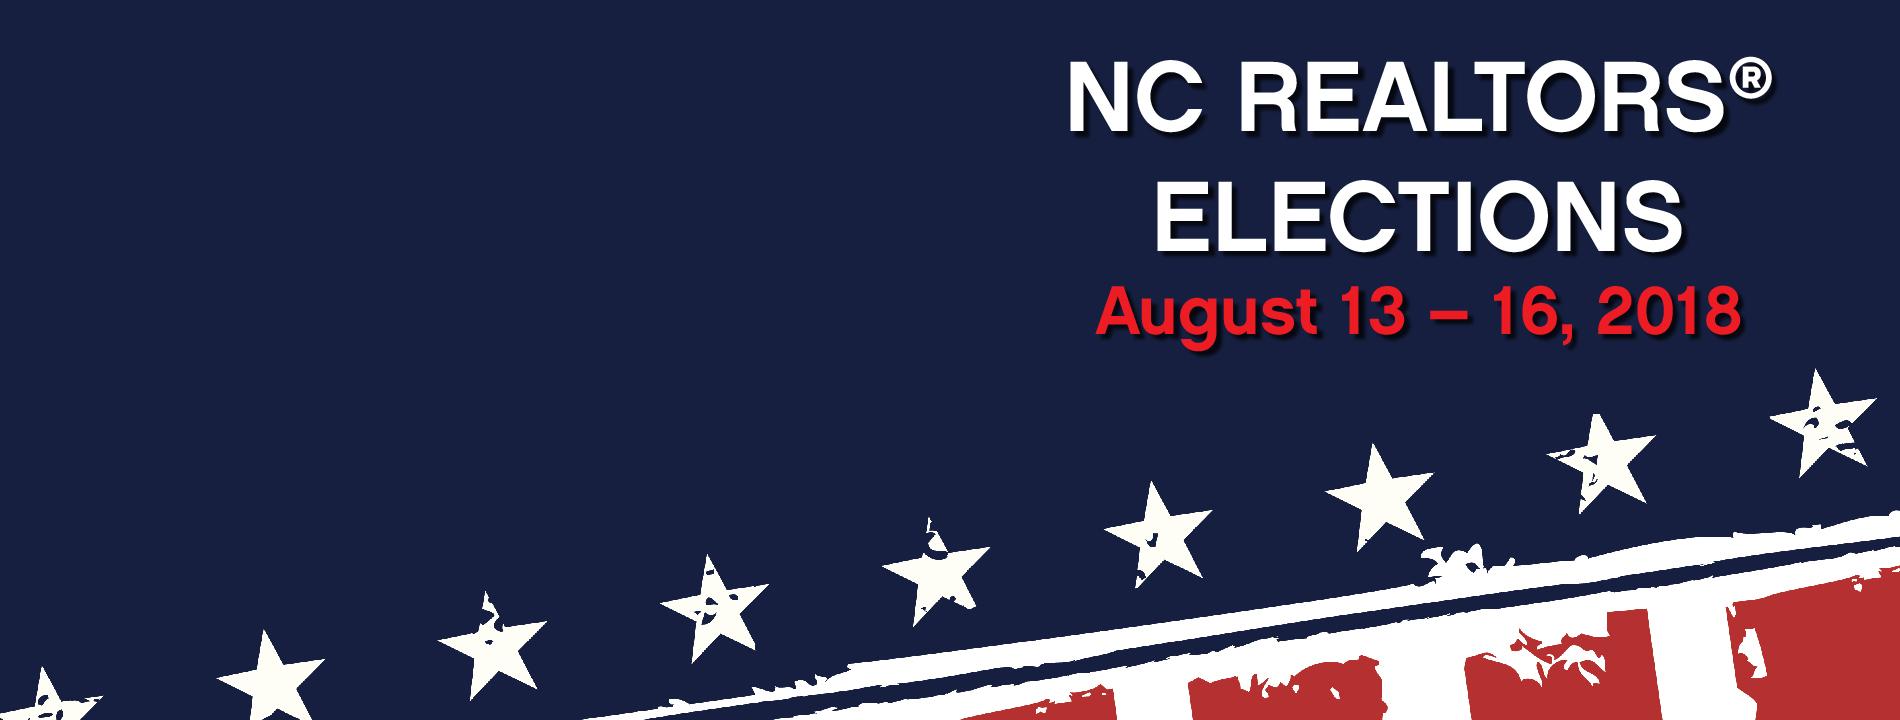 NC REALTORS Elections August 13 – 16, 2018